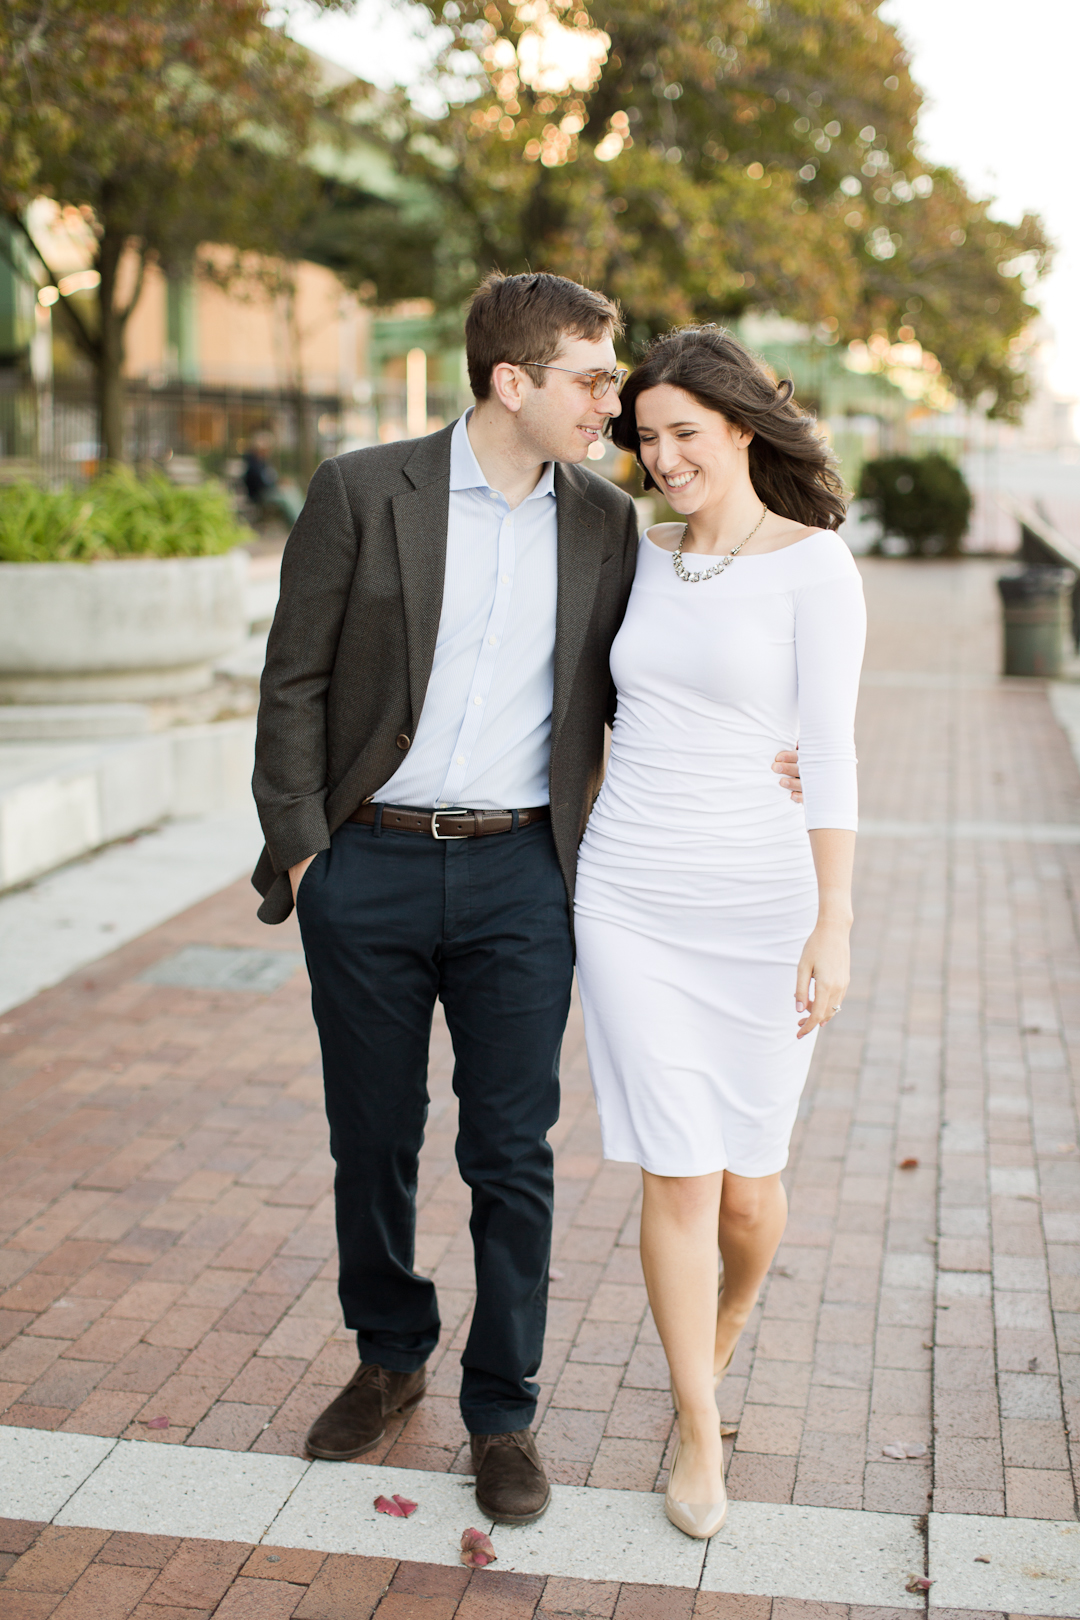 Melissa Kruse Photography - Christina & Alex Kips Bay Engagement Photos-113.jpg